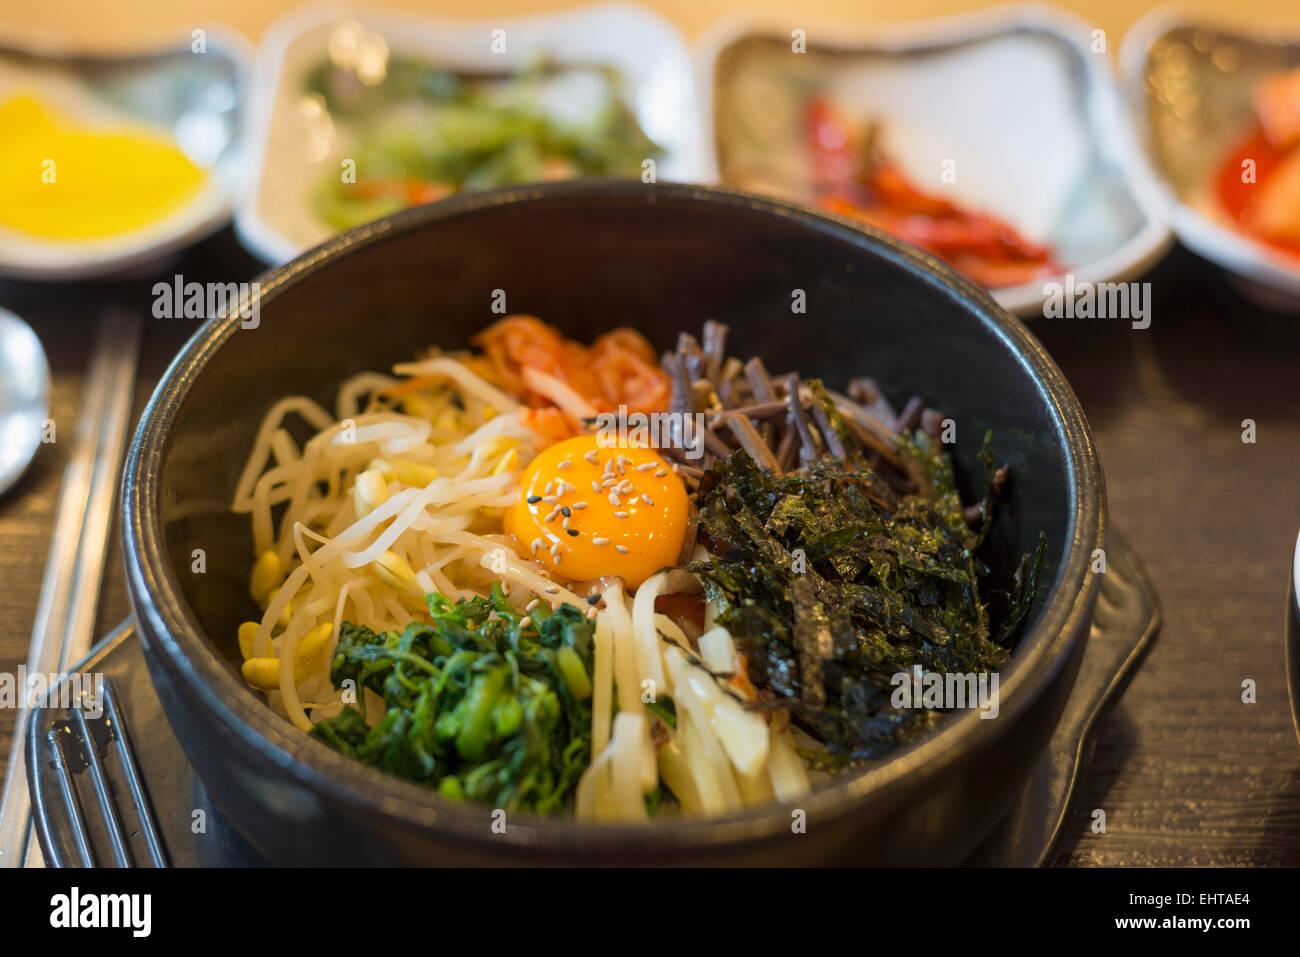 Asia, Republic of Korea, South Korea, Seoul, bibimpab restaurant - Stock Image